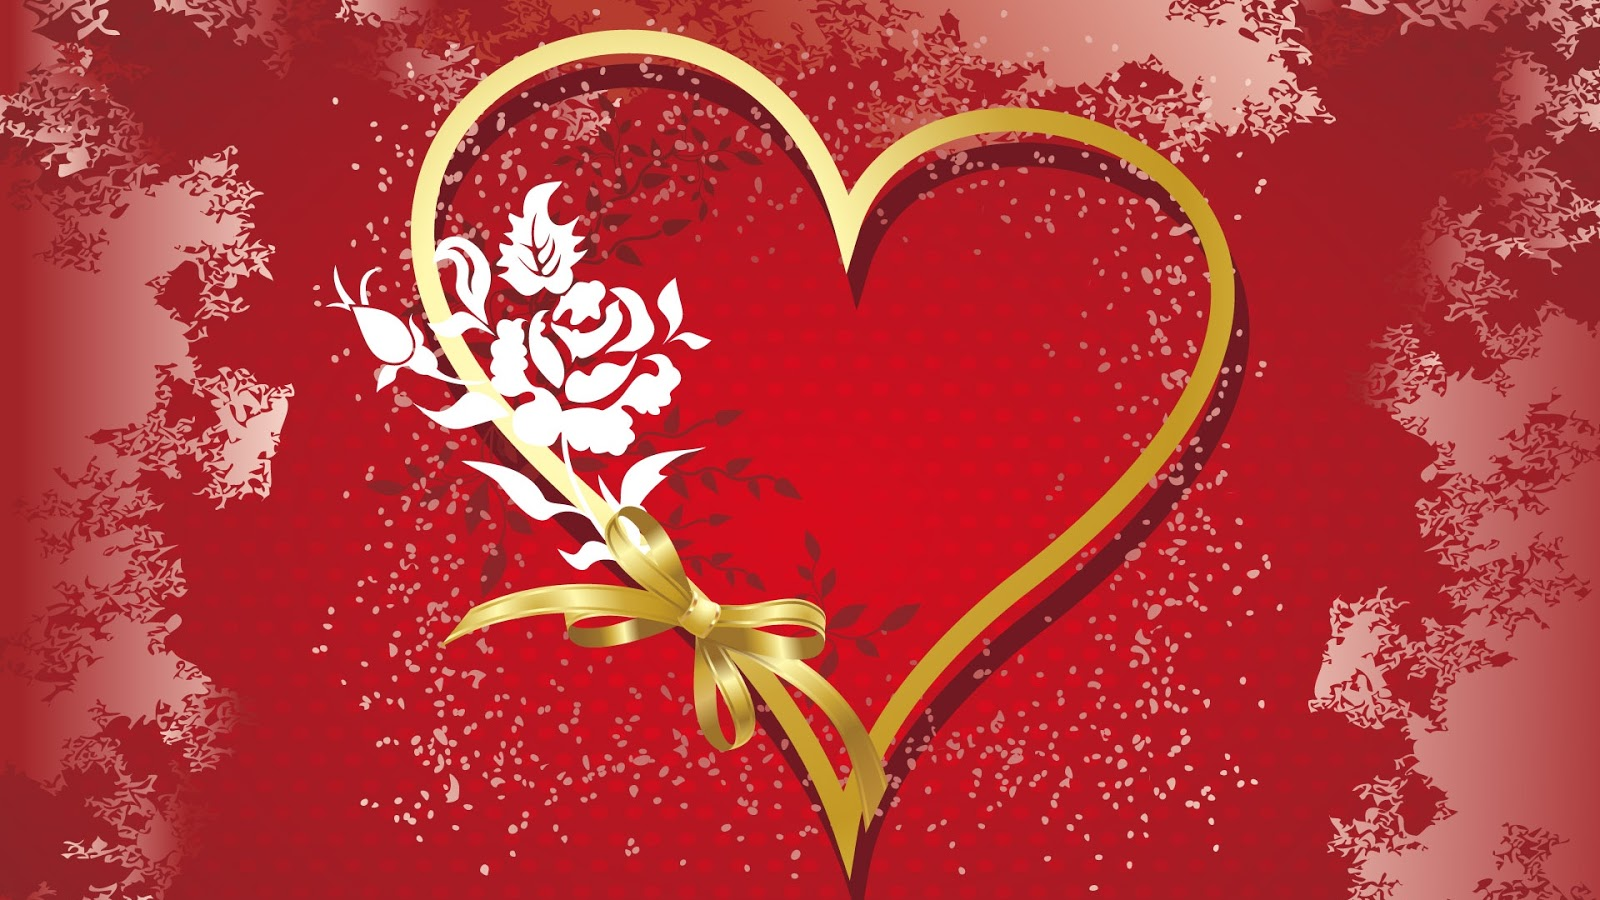 valentines day wallpaper download